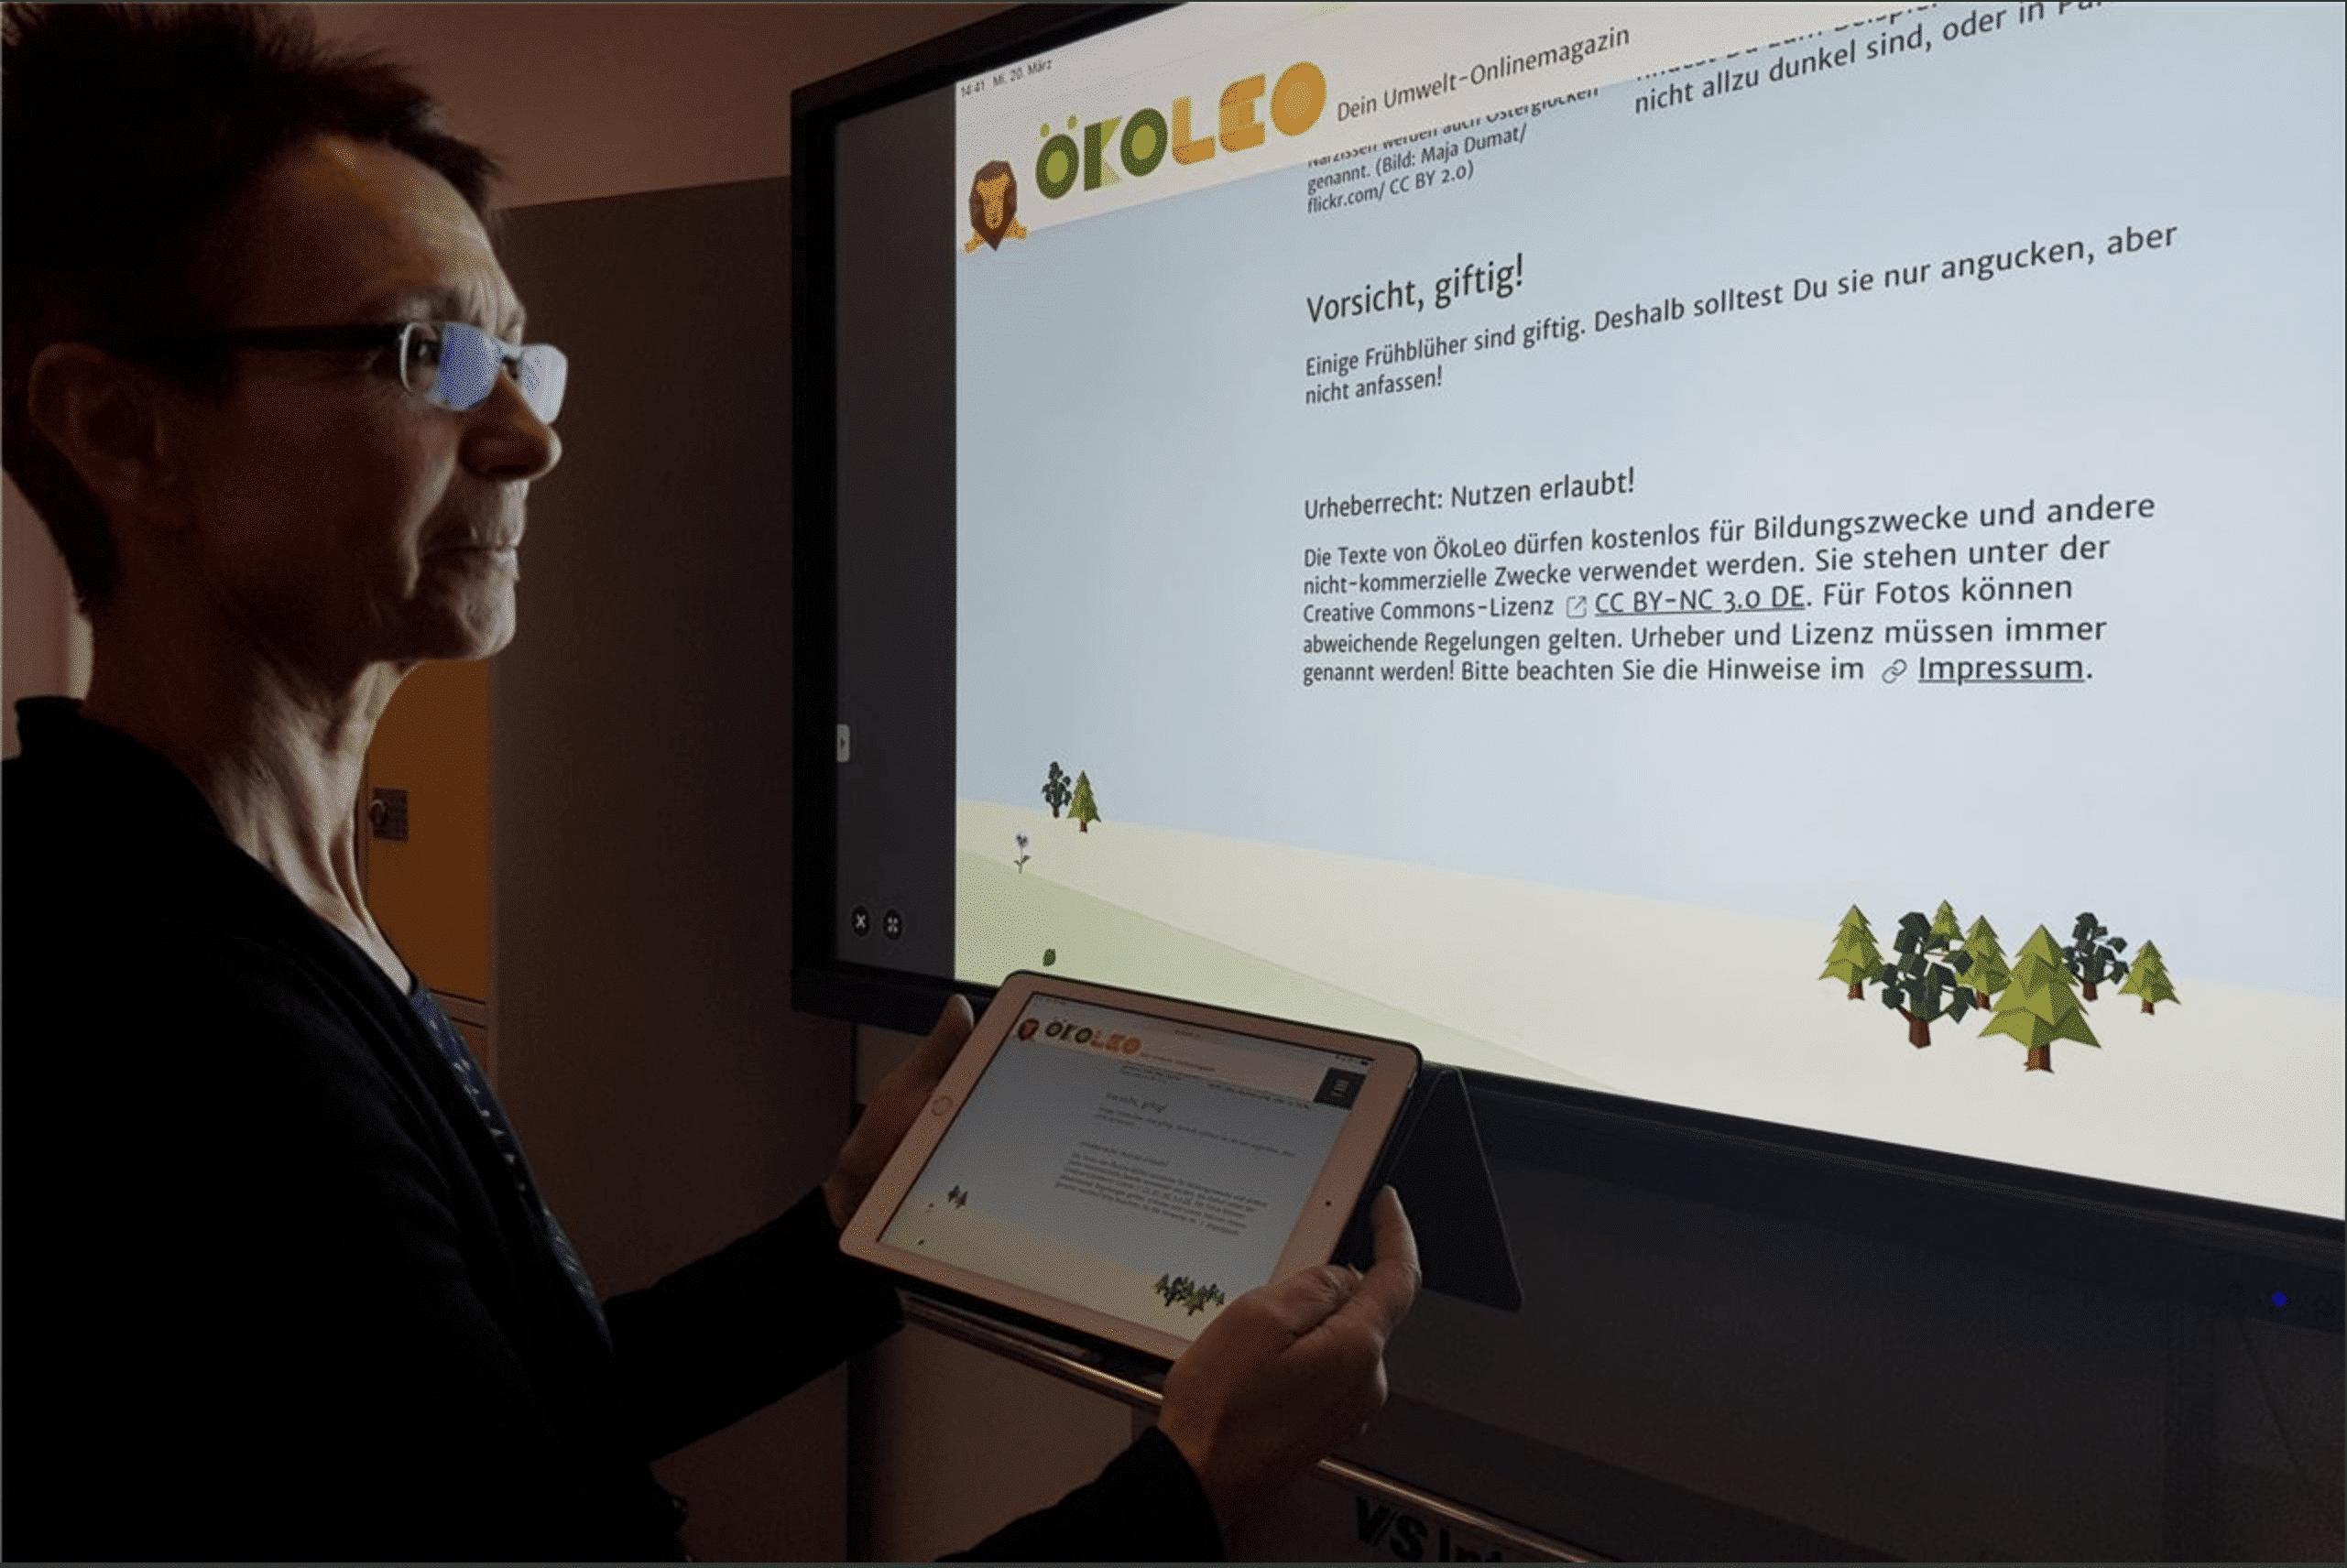 Ende der Kreidezeit: Schüler der Gesamtschule Fröndenberg lernen am Bildschirm